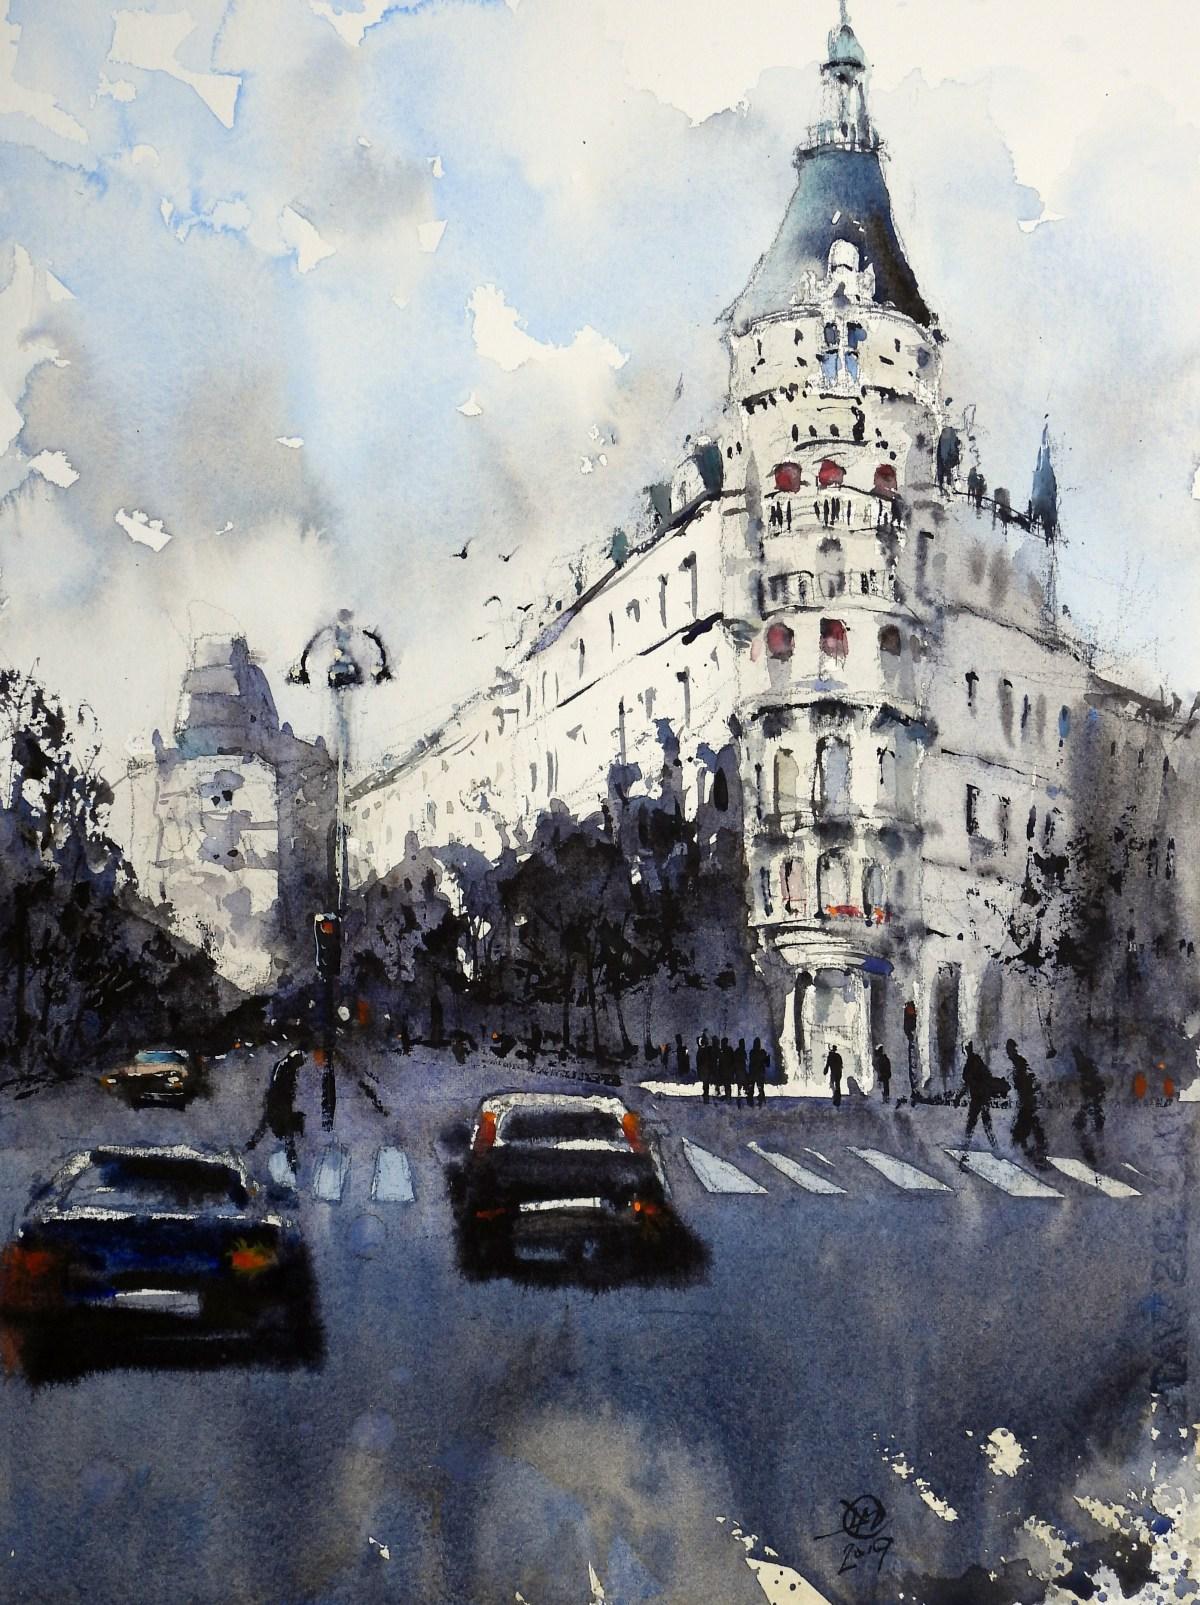 Birger Jarlsgatan by Davdi Meldrum